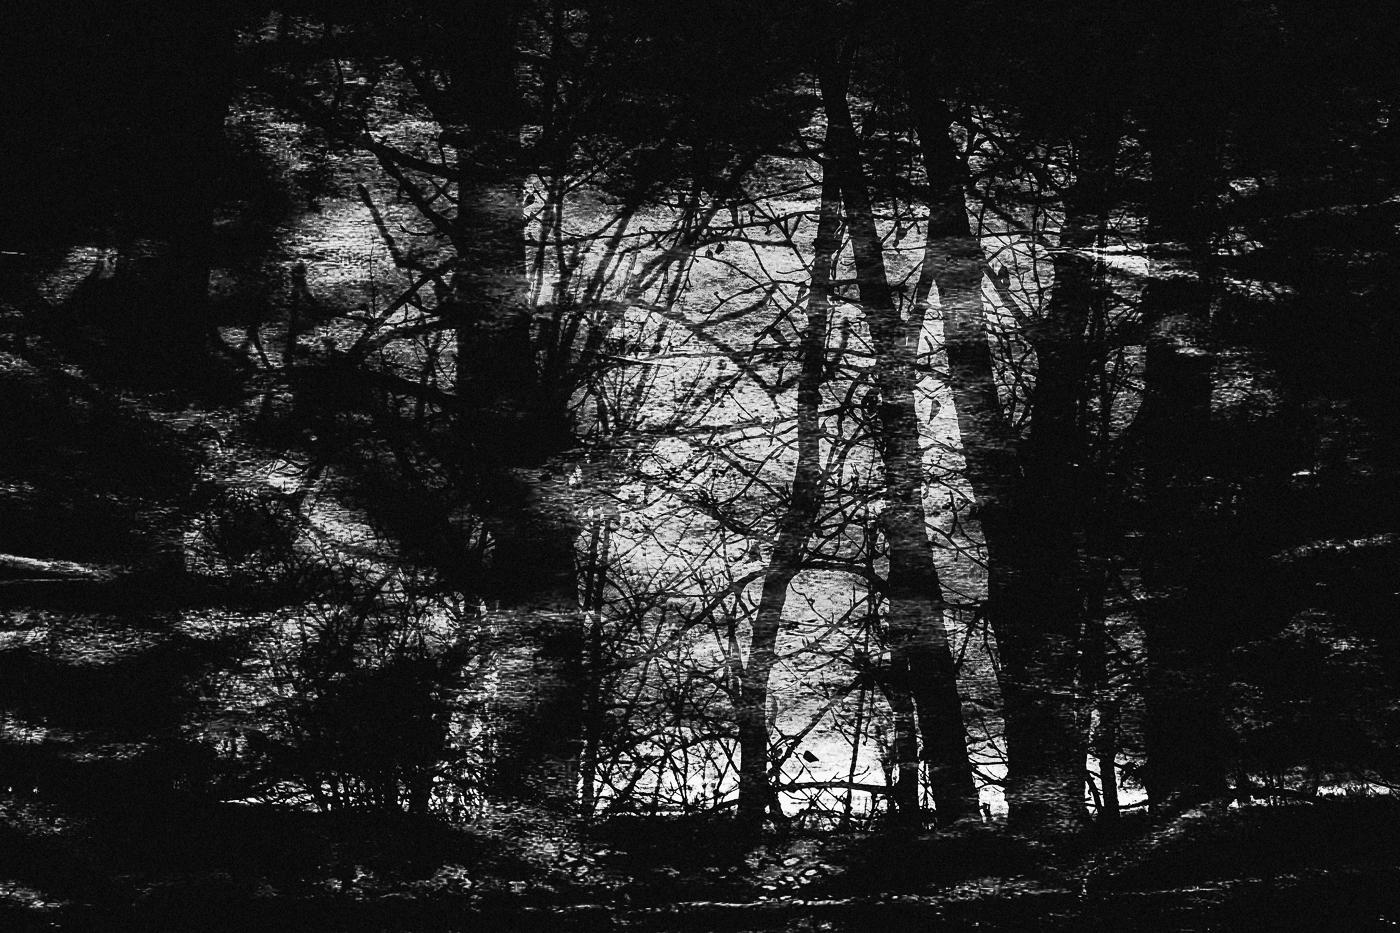 hb images - woods b-w - 8